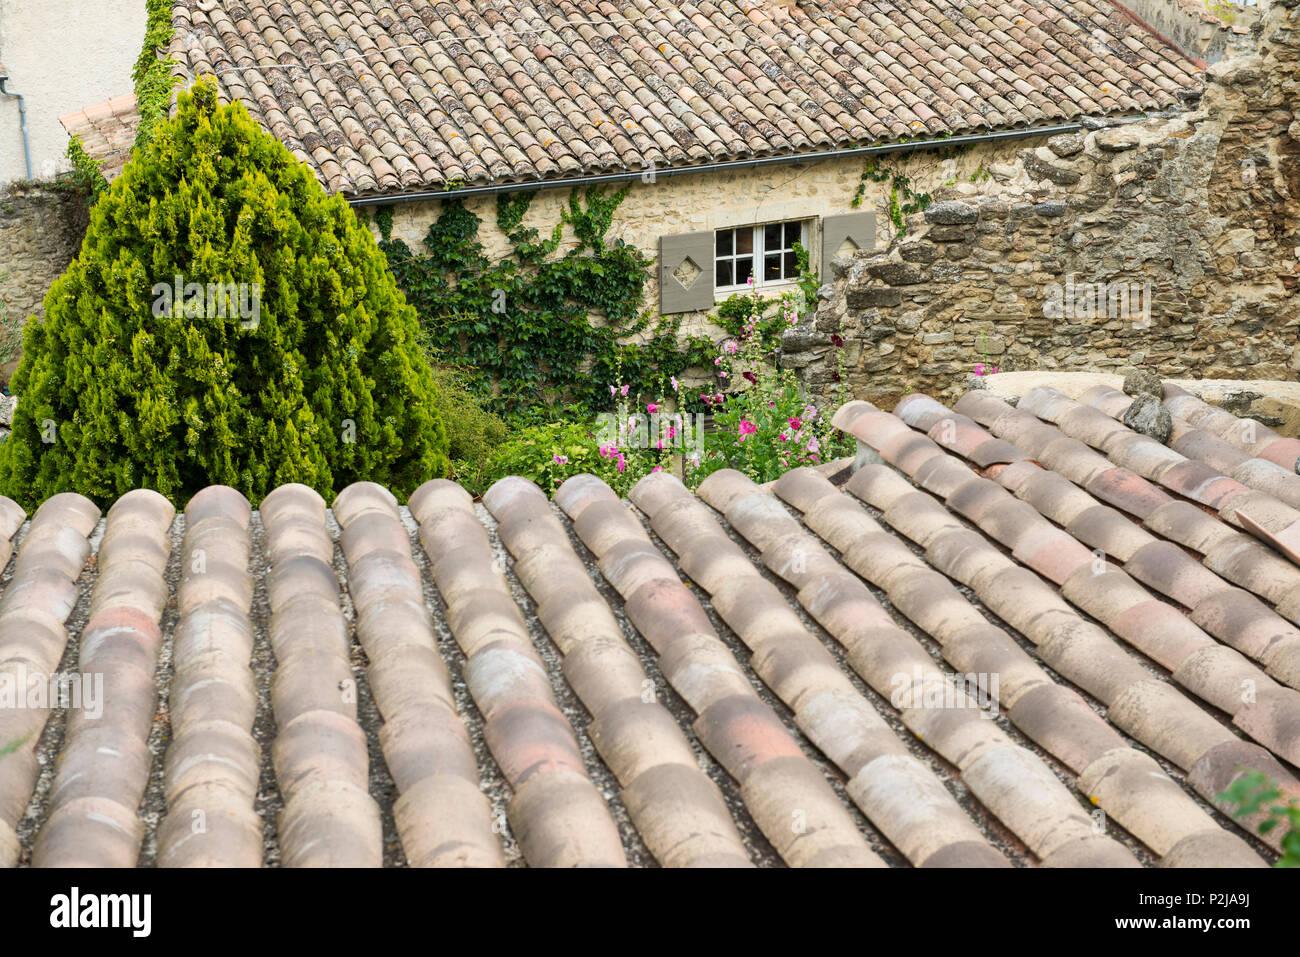 House roof in Grignan, Departement Drome, Region Rhones-Alpes, Provence, France - Stock Image